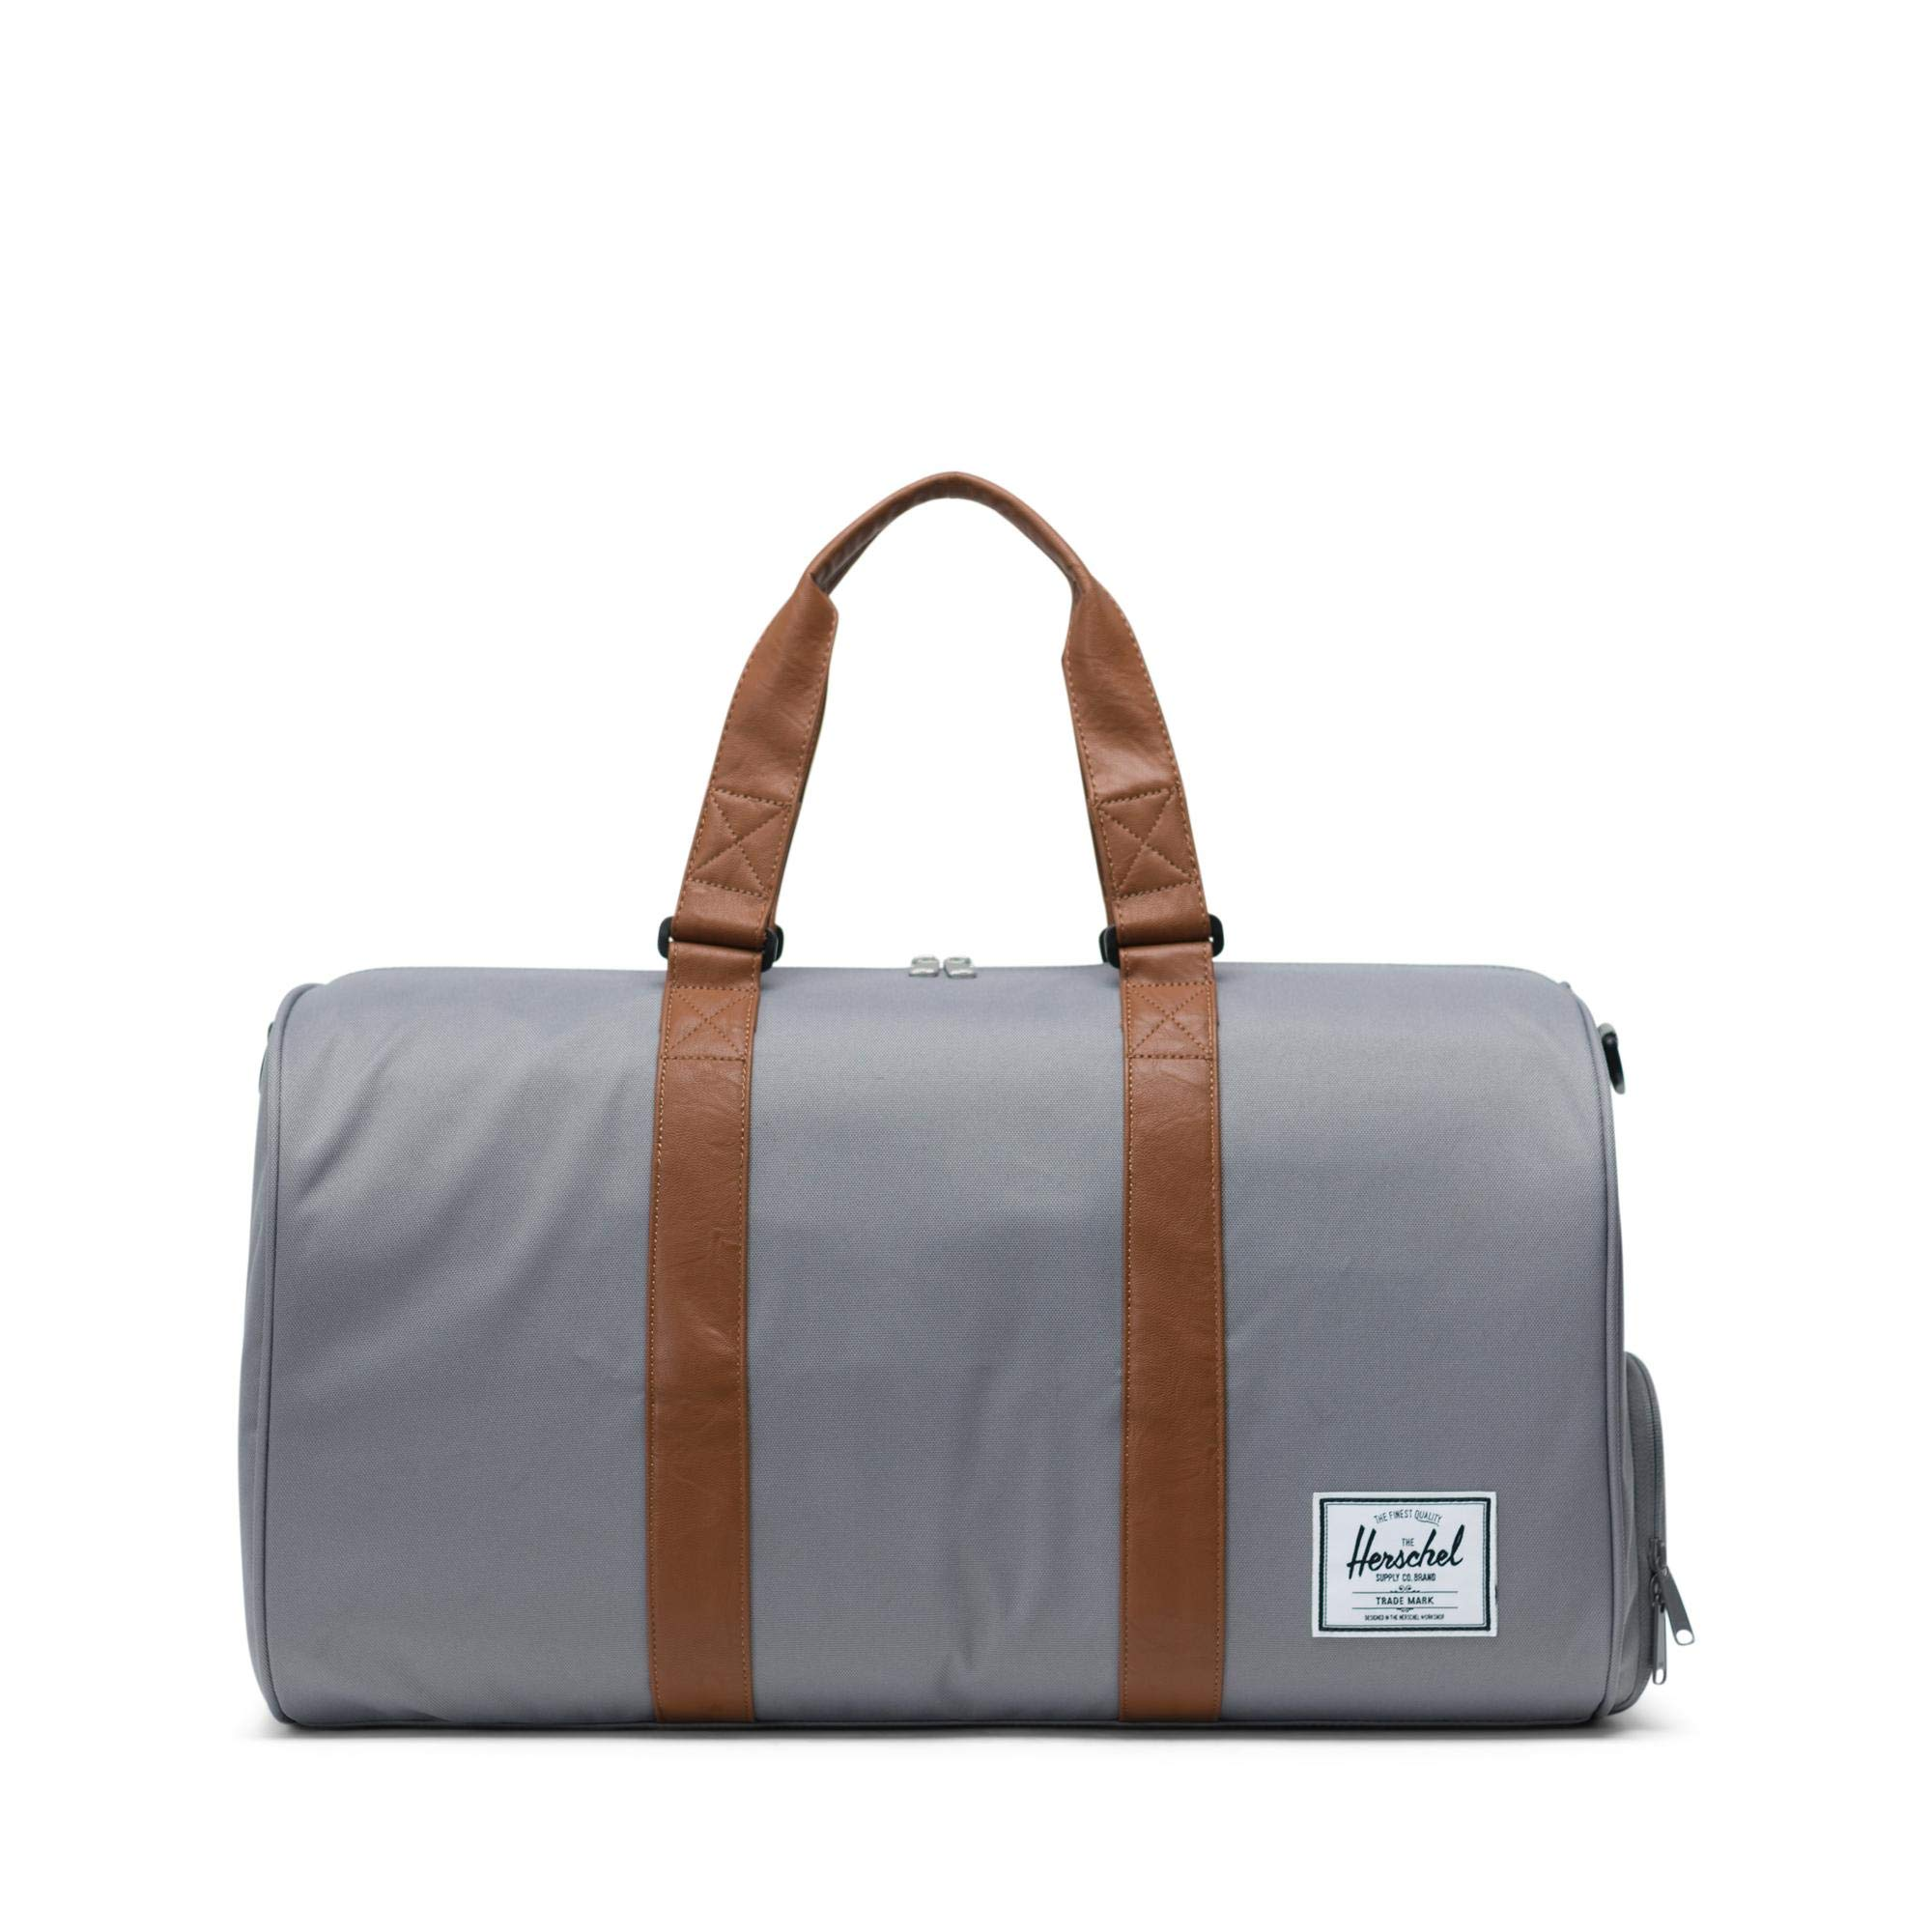 Herschel Novel Duffle Bag, Grey, One Size